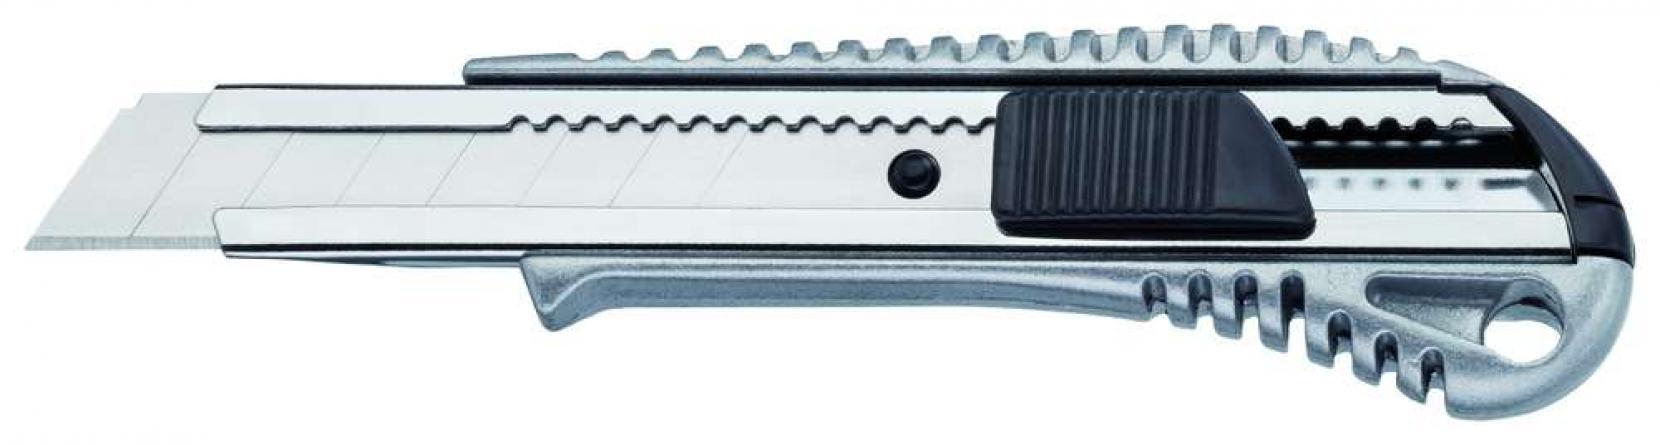 Storch Profi  Нож с отламываемыми лезвиями, 18мм 356010